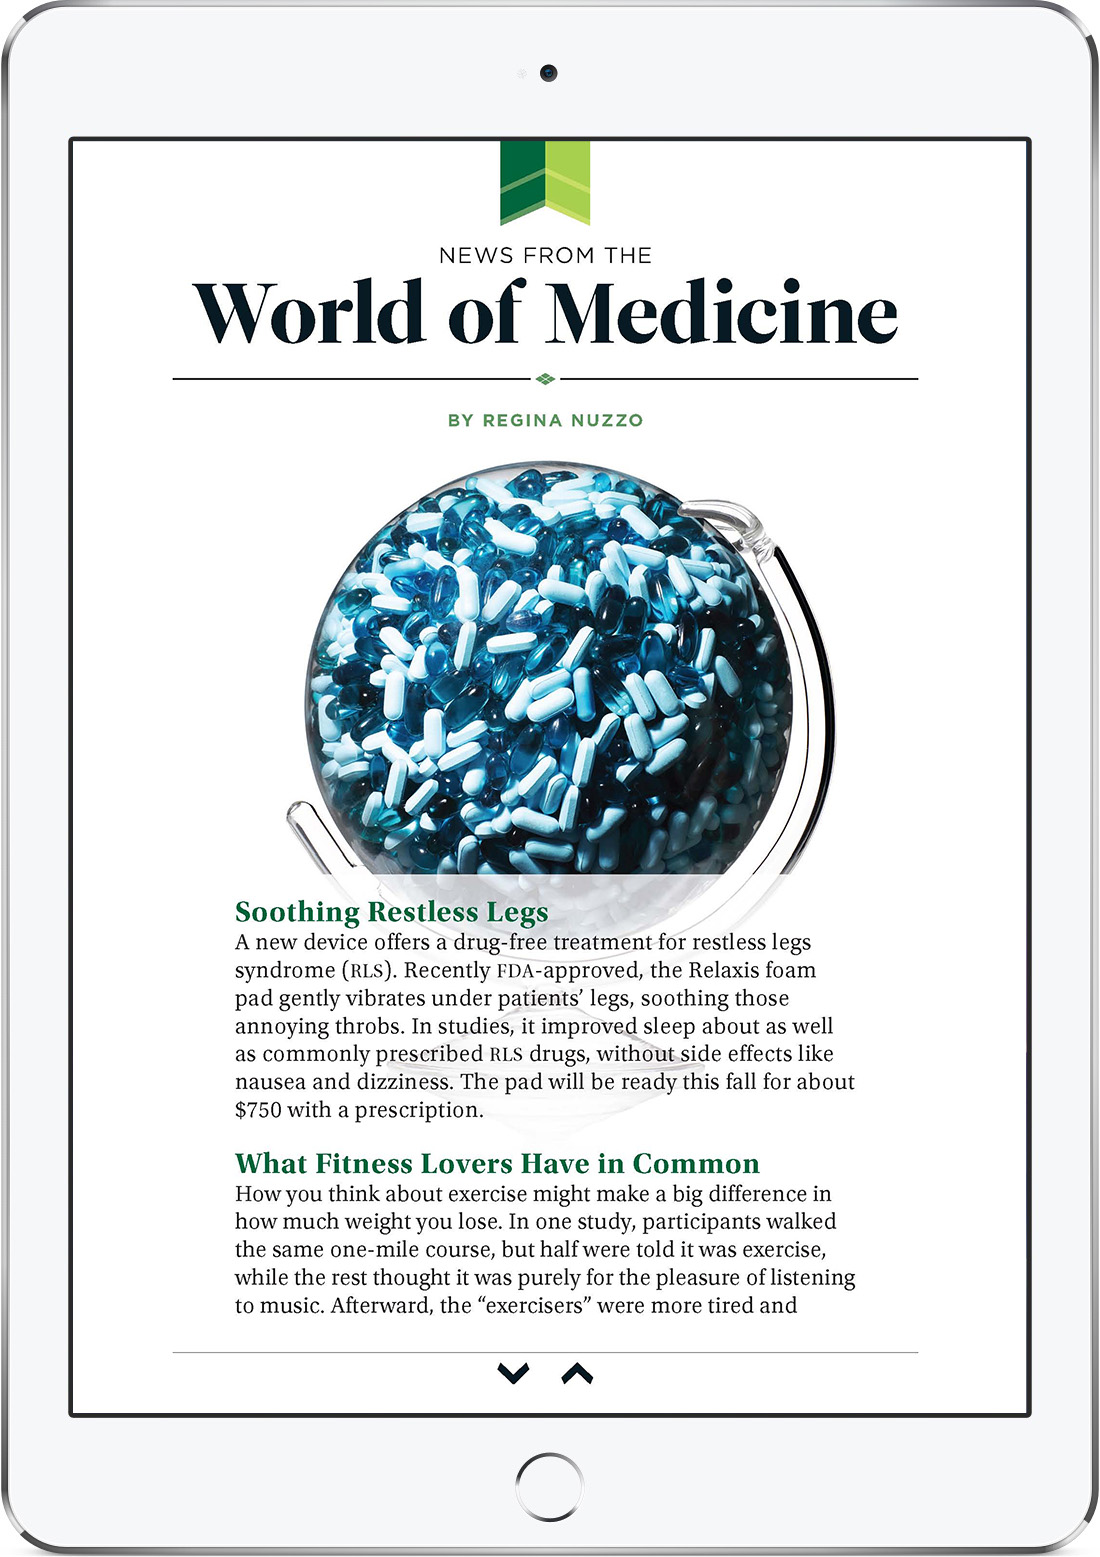 iPad_RD_NFWOM_Globe_Pills.jpg